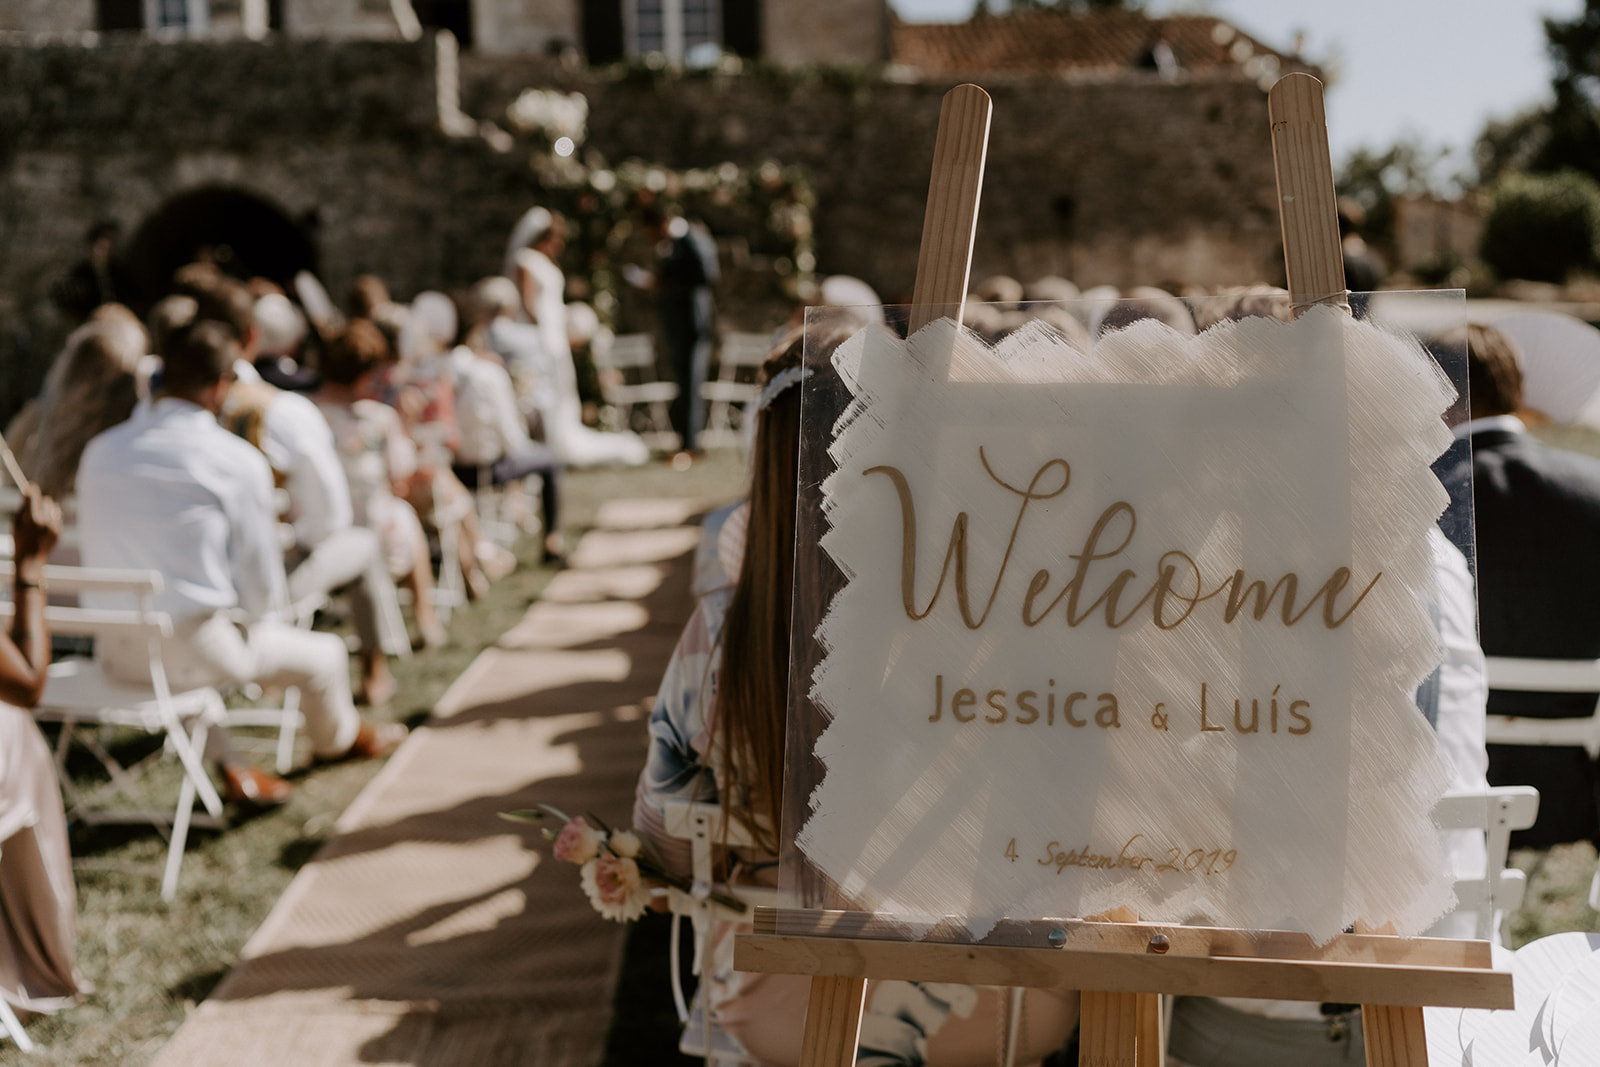 mariage-domaine-lagut-welcome-ceremonie